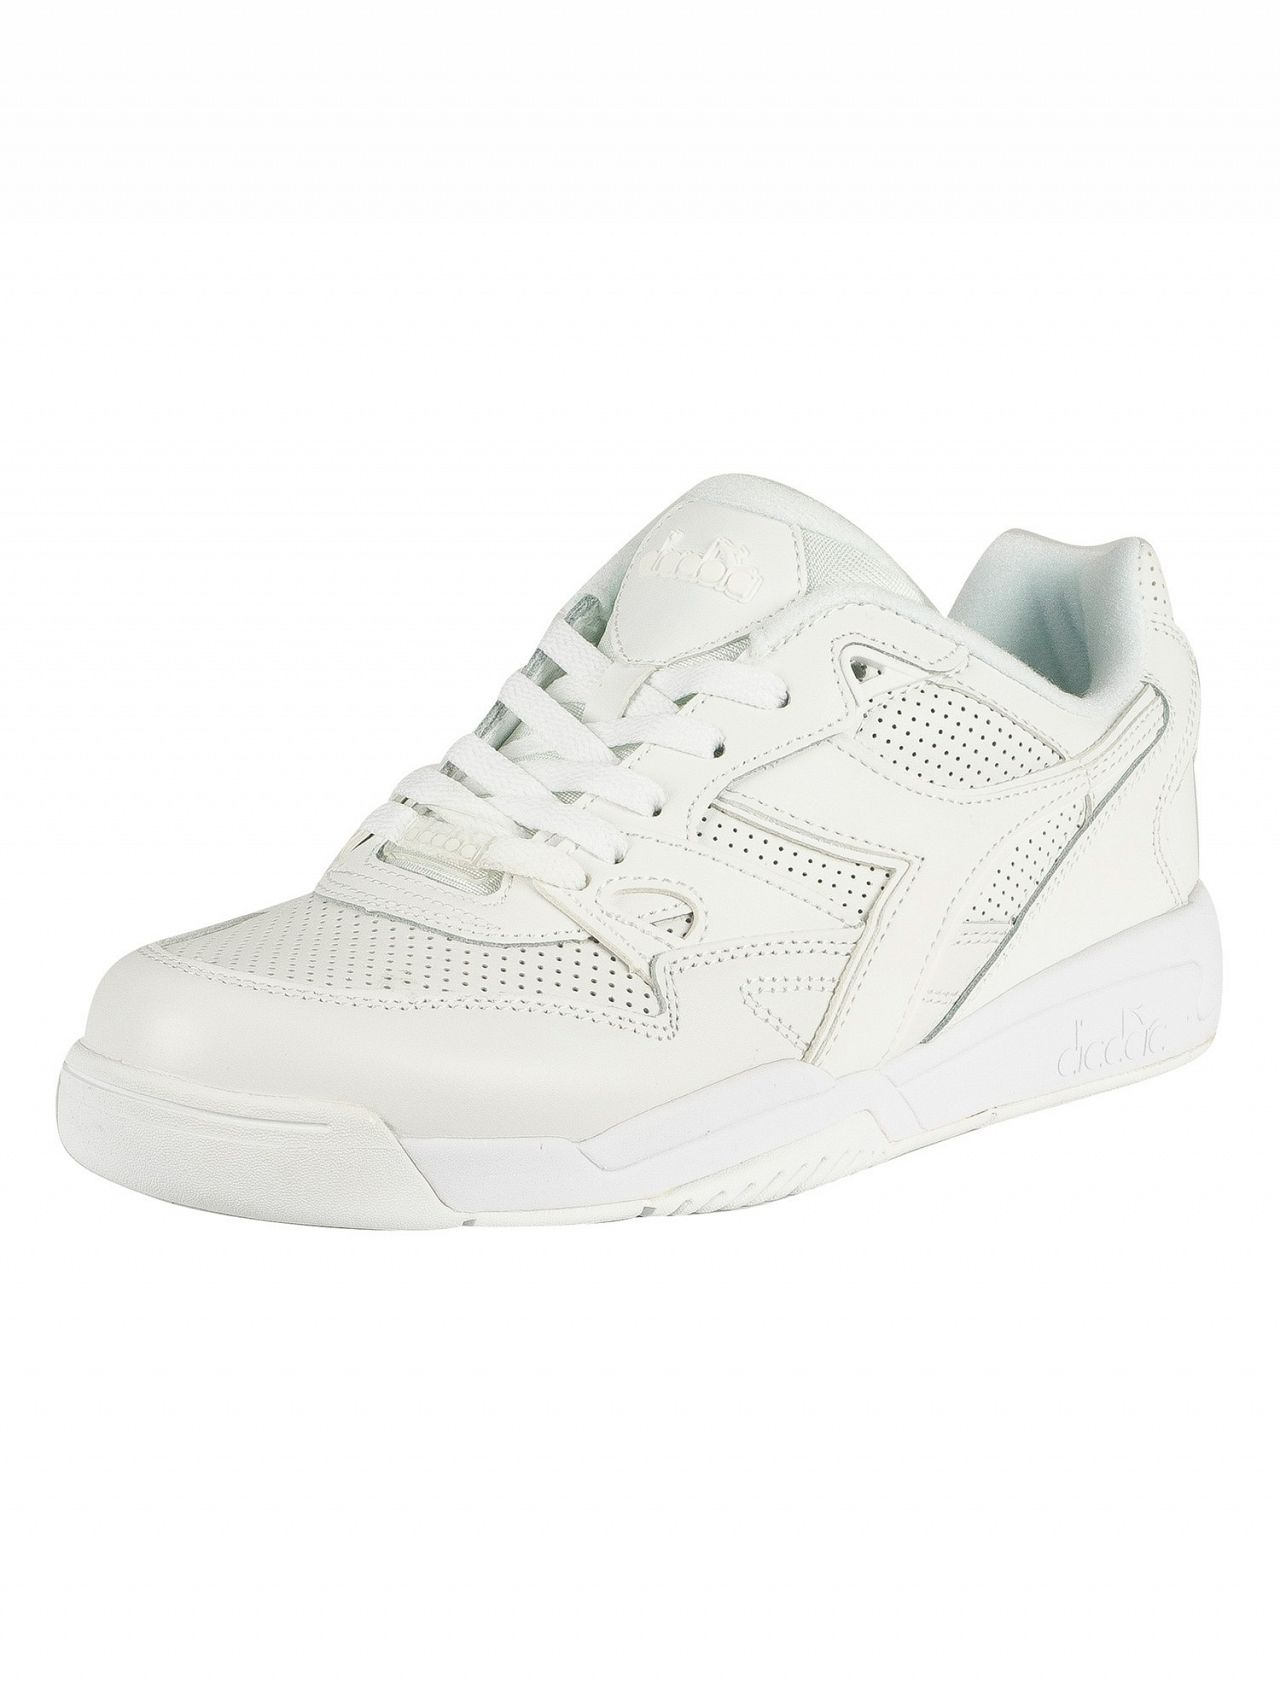 35901fd7 Diadora White Rebound Ace Leather Trainers